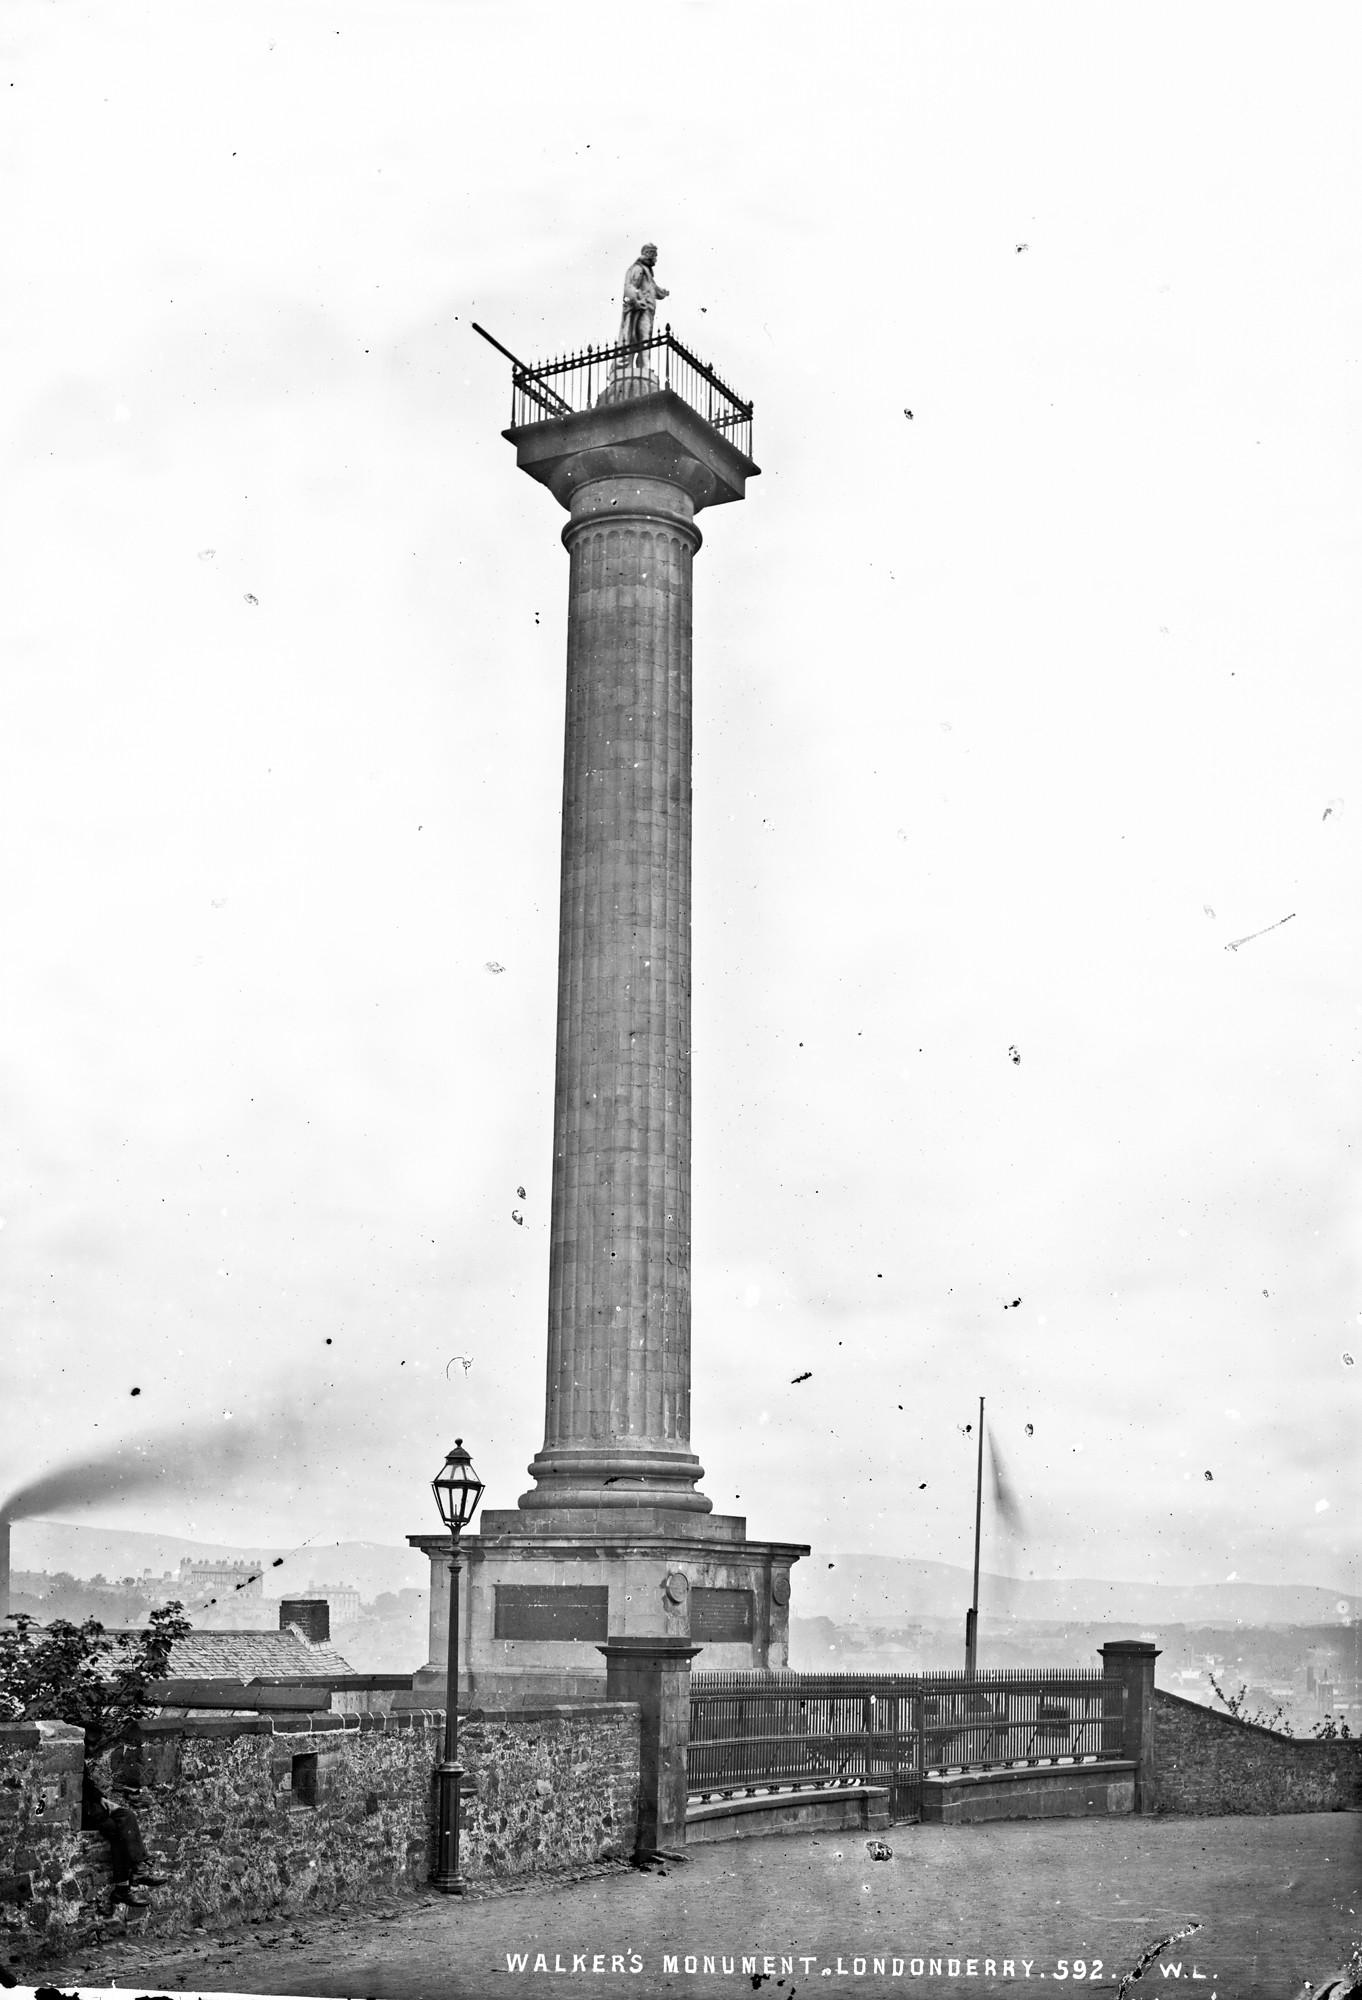 Walker's Monument, Derry City, Co. Derry